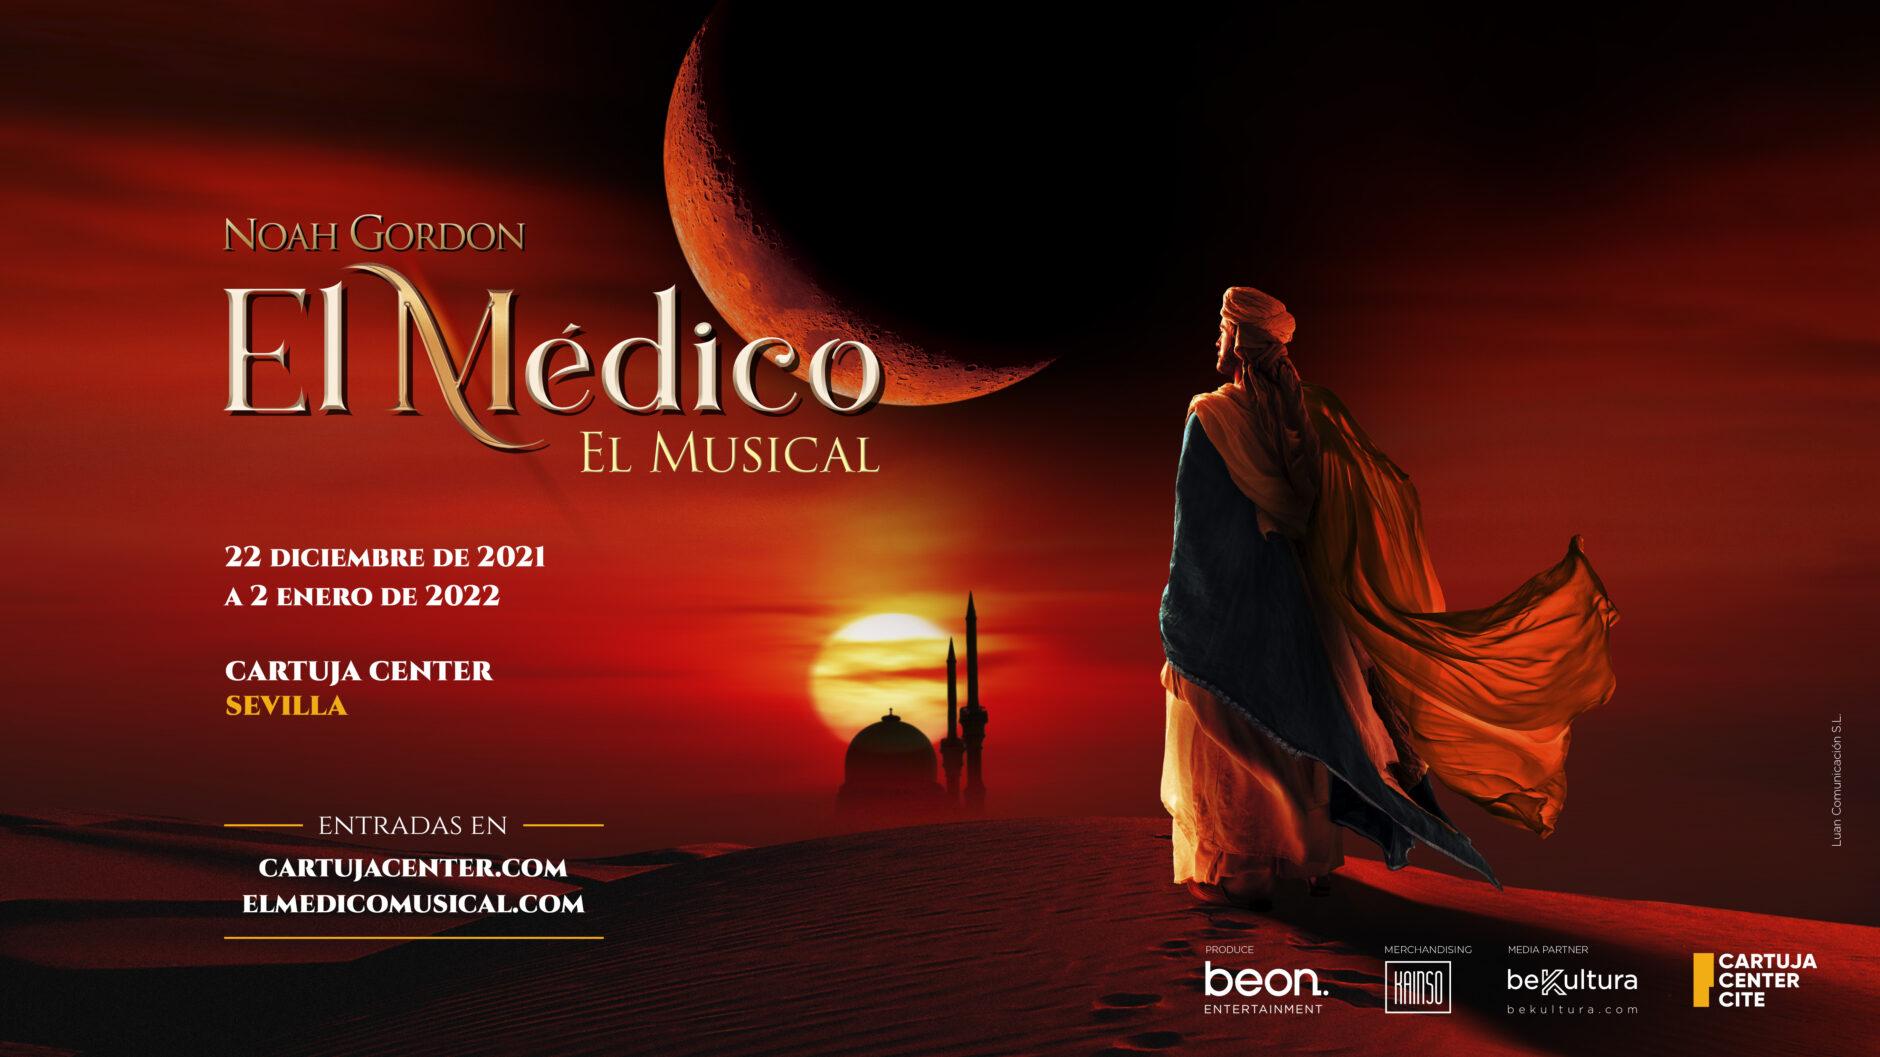 'El Médico' el musical elige Cartuja Center CITE para iniciar su gira nacional 1